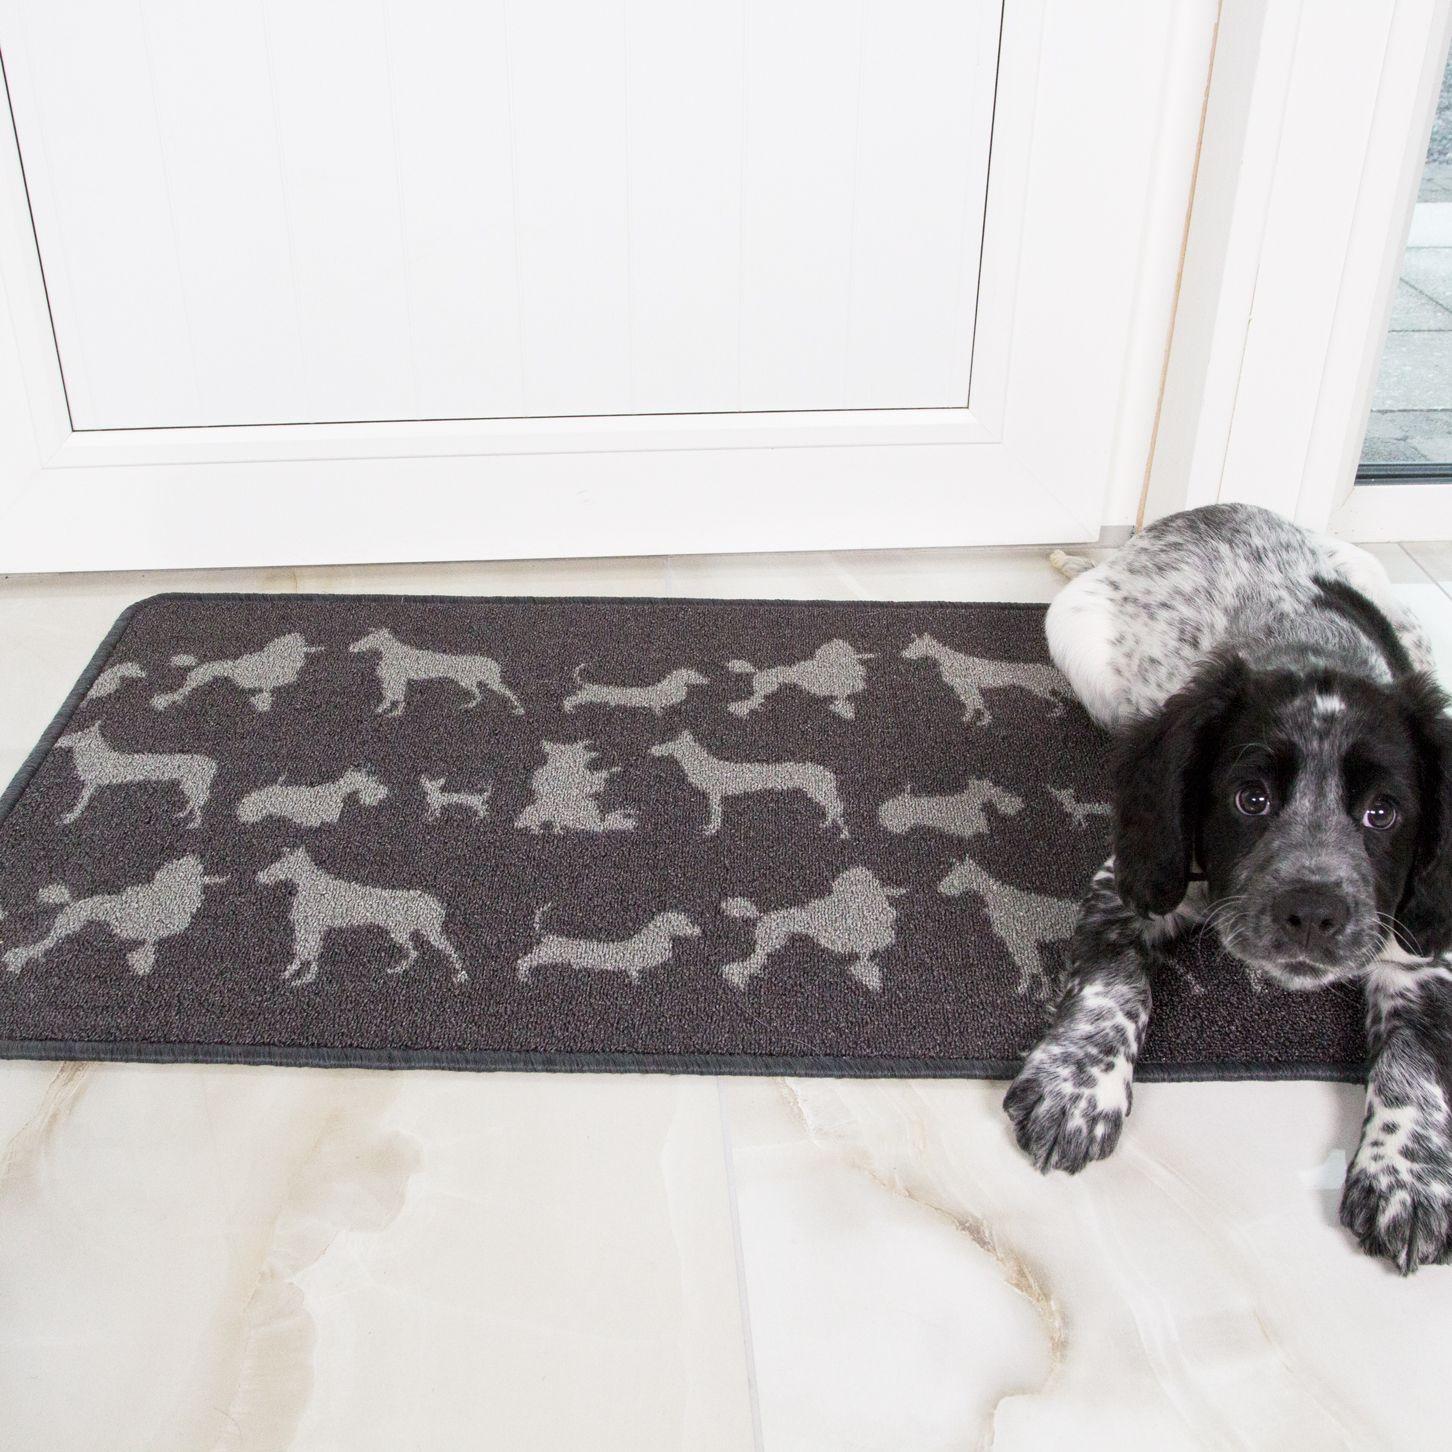 Canine Print Washable Non Slip Kitchen Mats Luna 66x110 Washable Kitchen Mat Doorway Mat